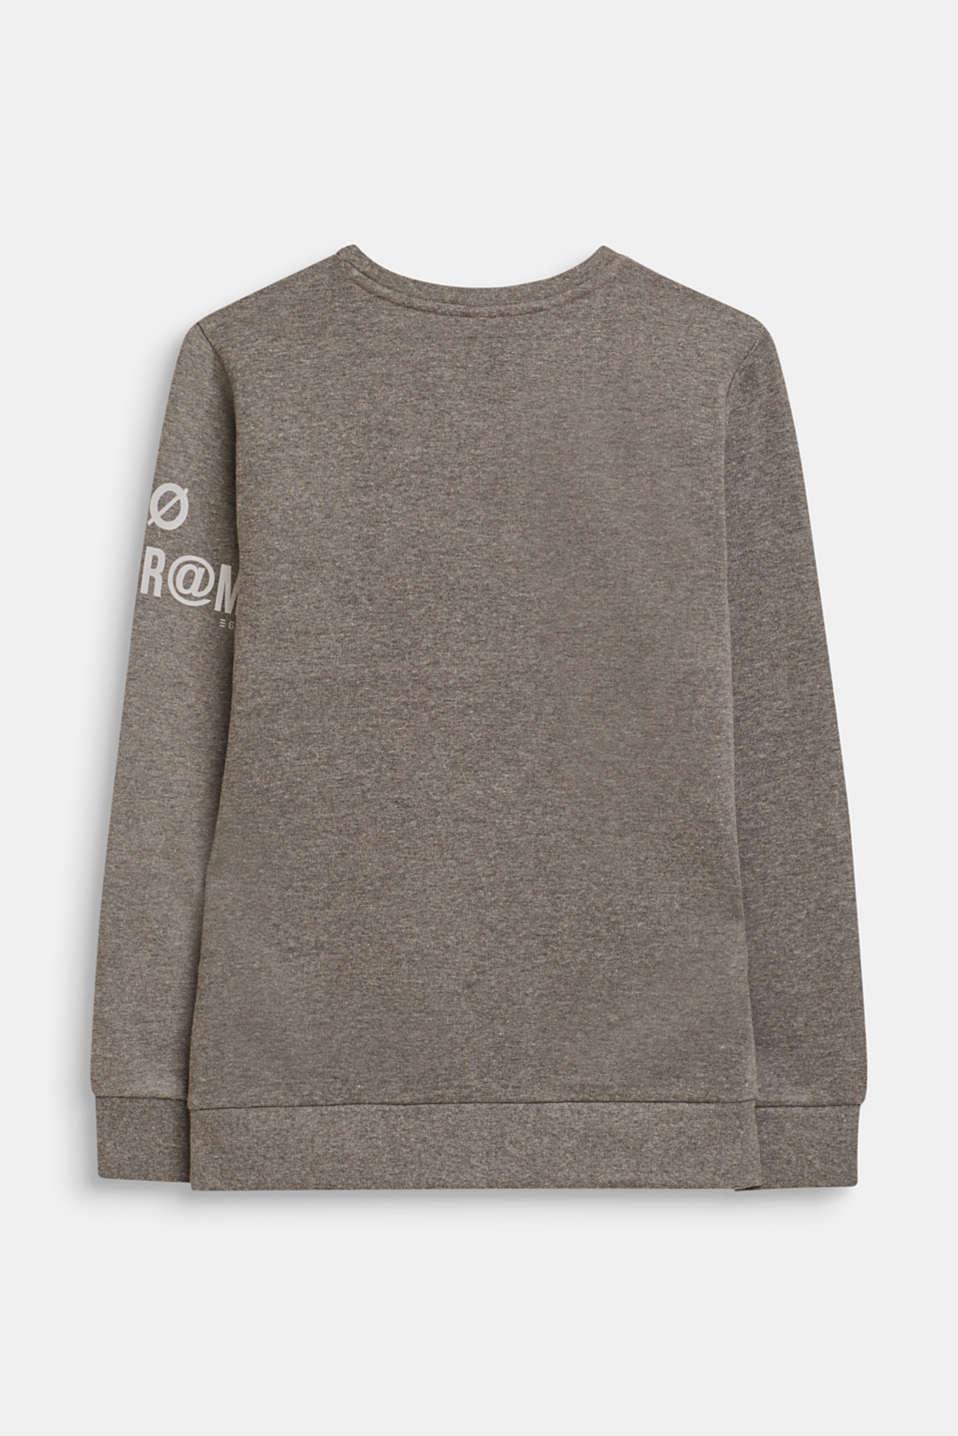 Sweatshirt with print and a zip detail, LCDARK HEATHER G, detail image number 1